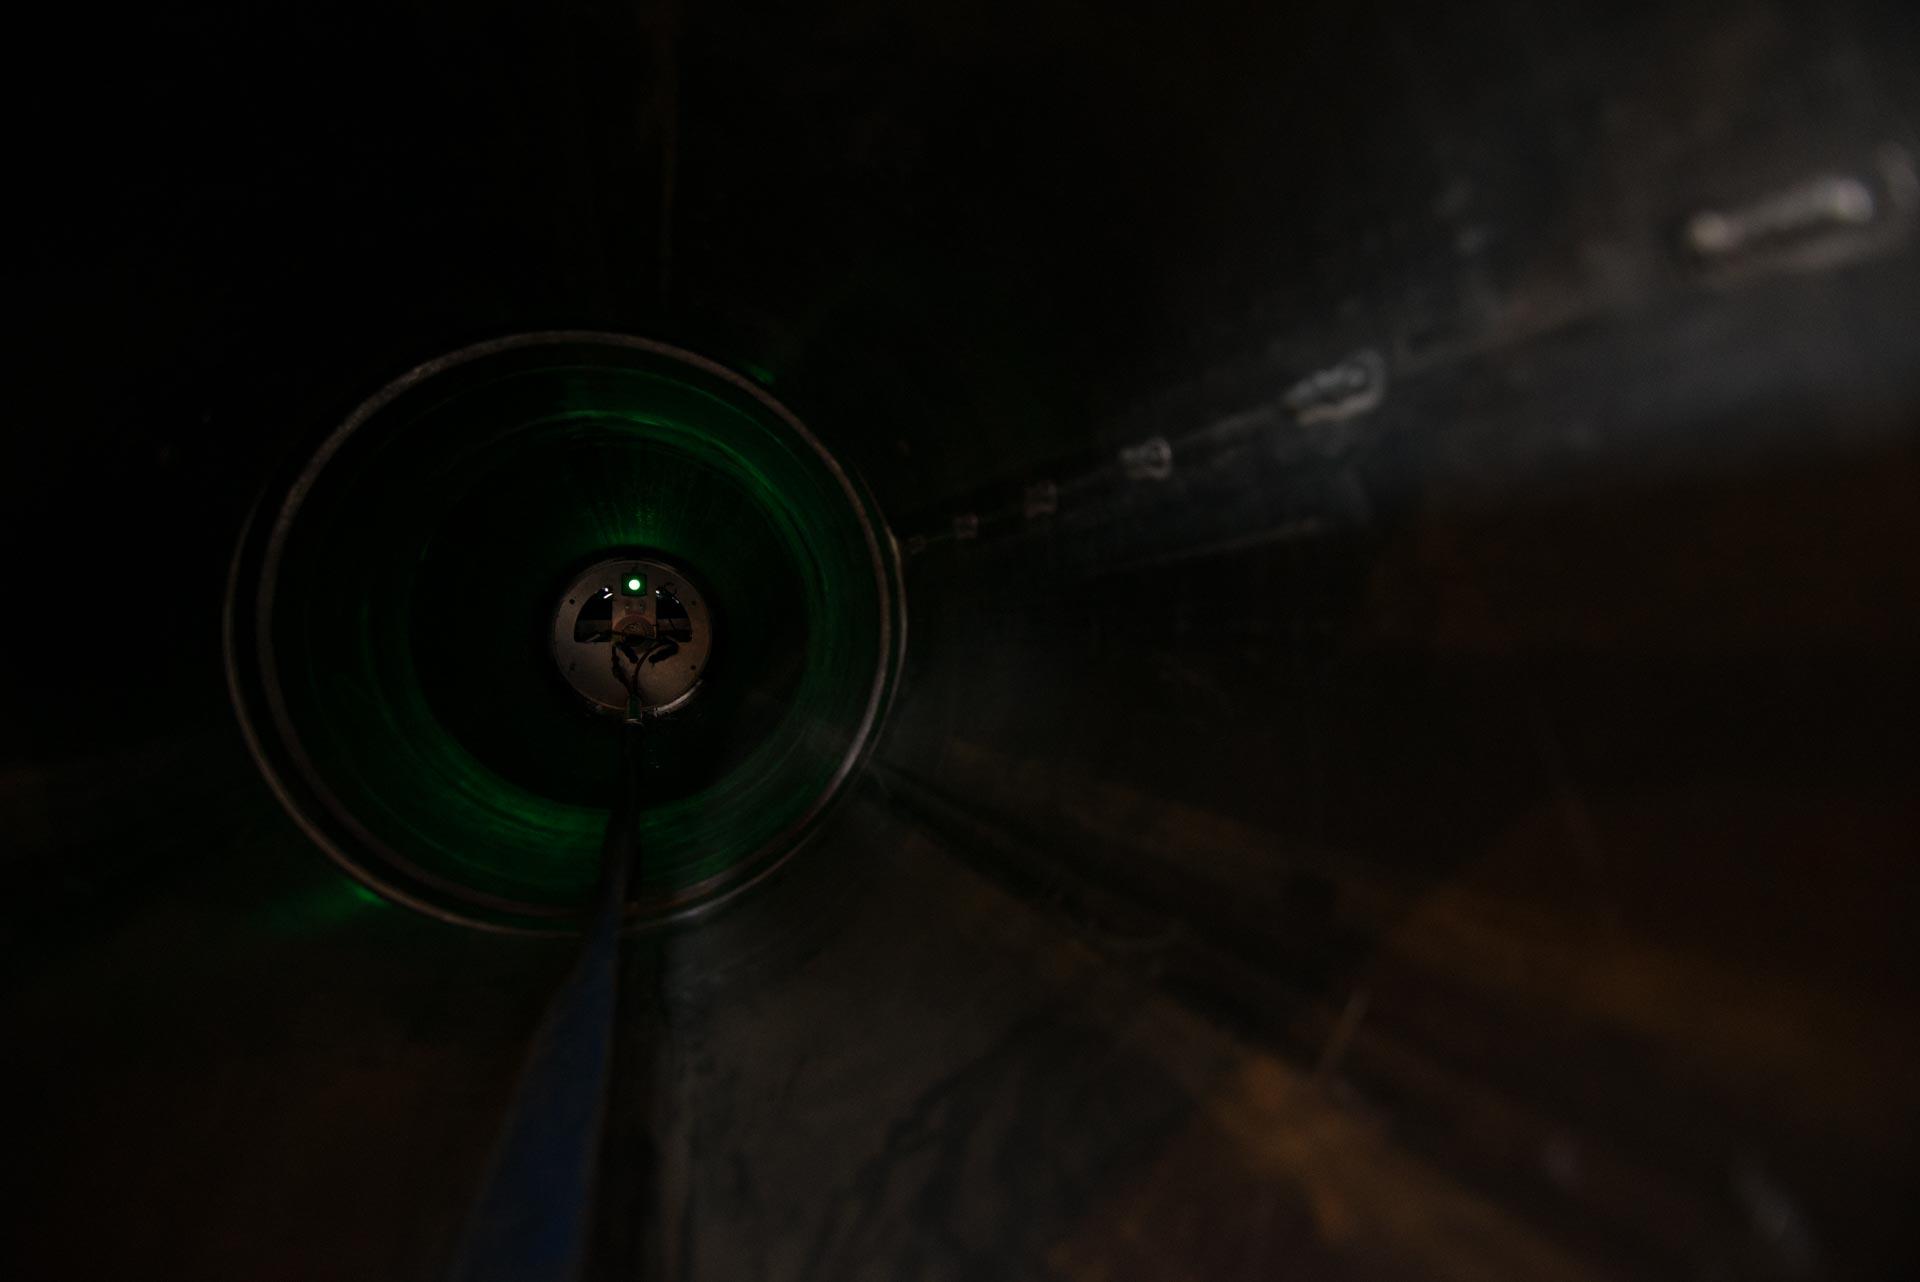 Oss-nor_2019_05_13_Amric_Subsea_Truck_Sveising_Low_res_FB_Steve-8816.JPG